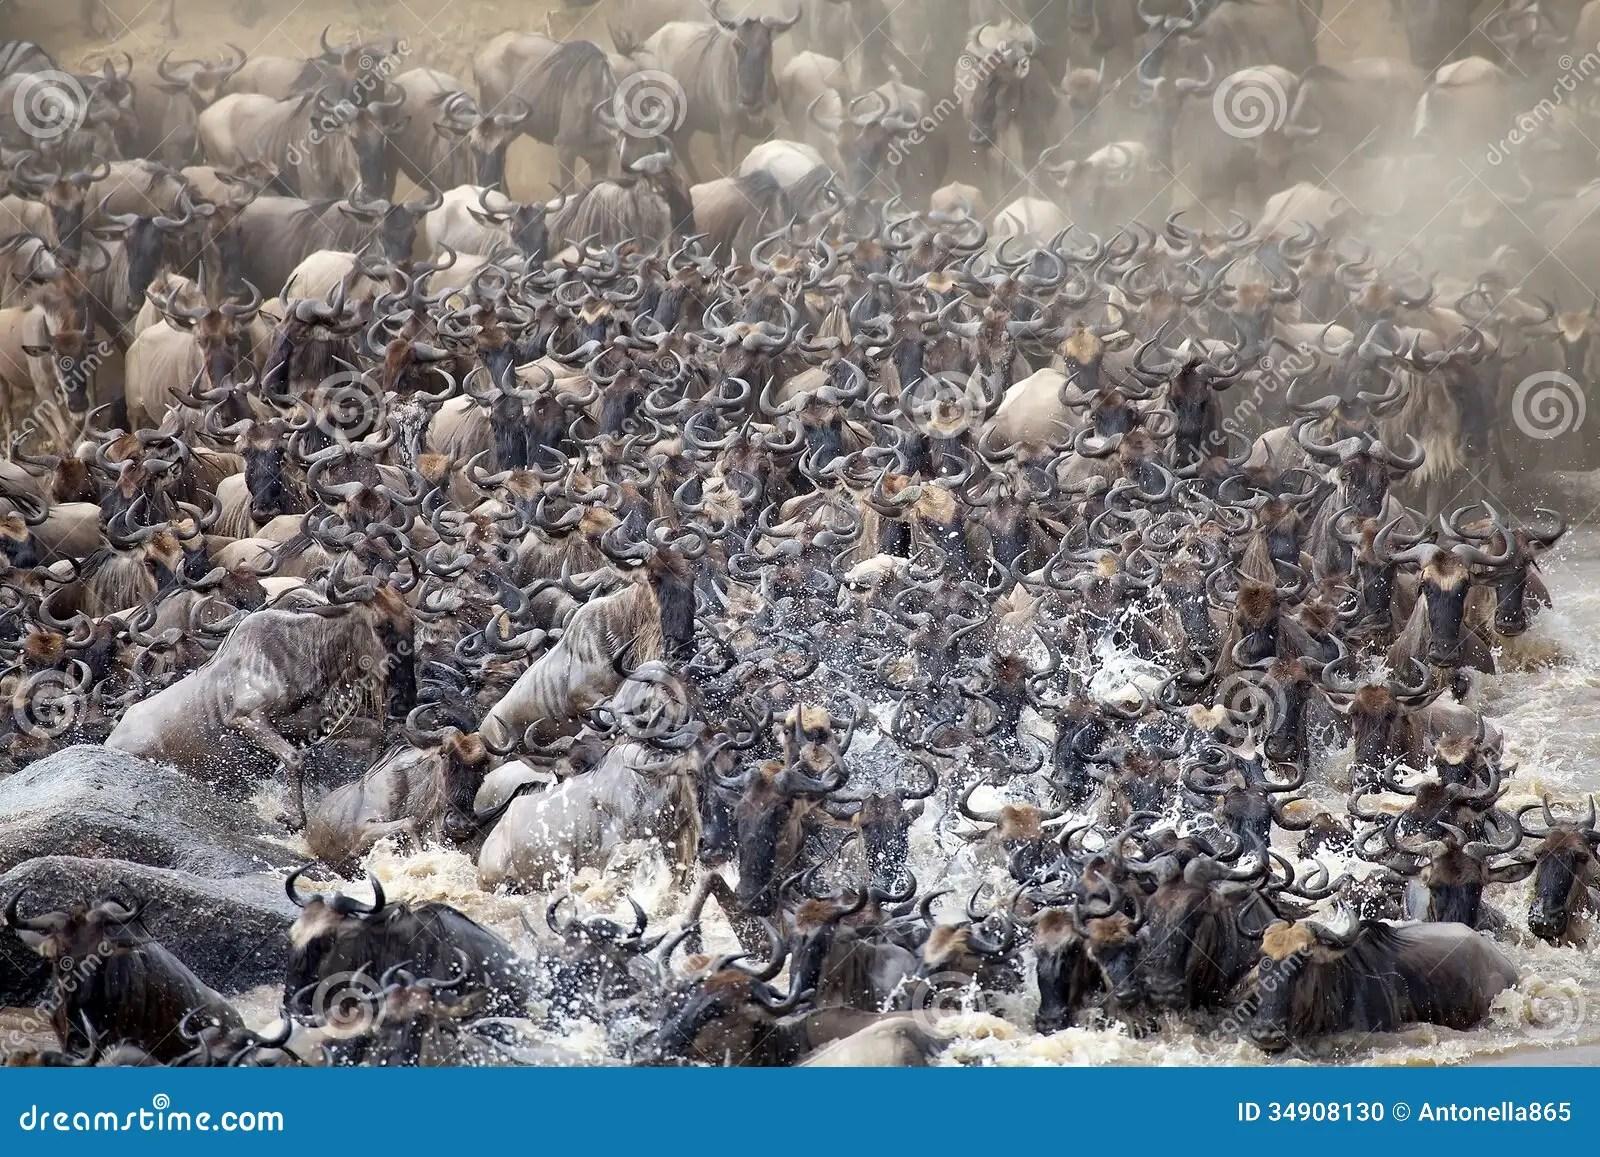 Wildebeest Connochaetes Taurinus Stock Photo